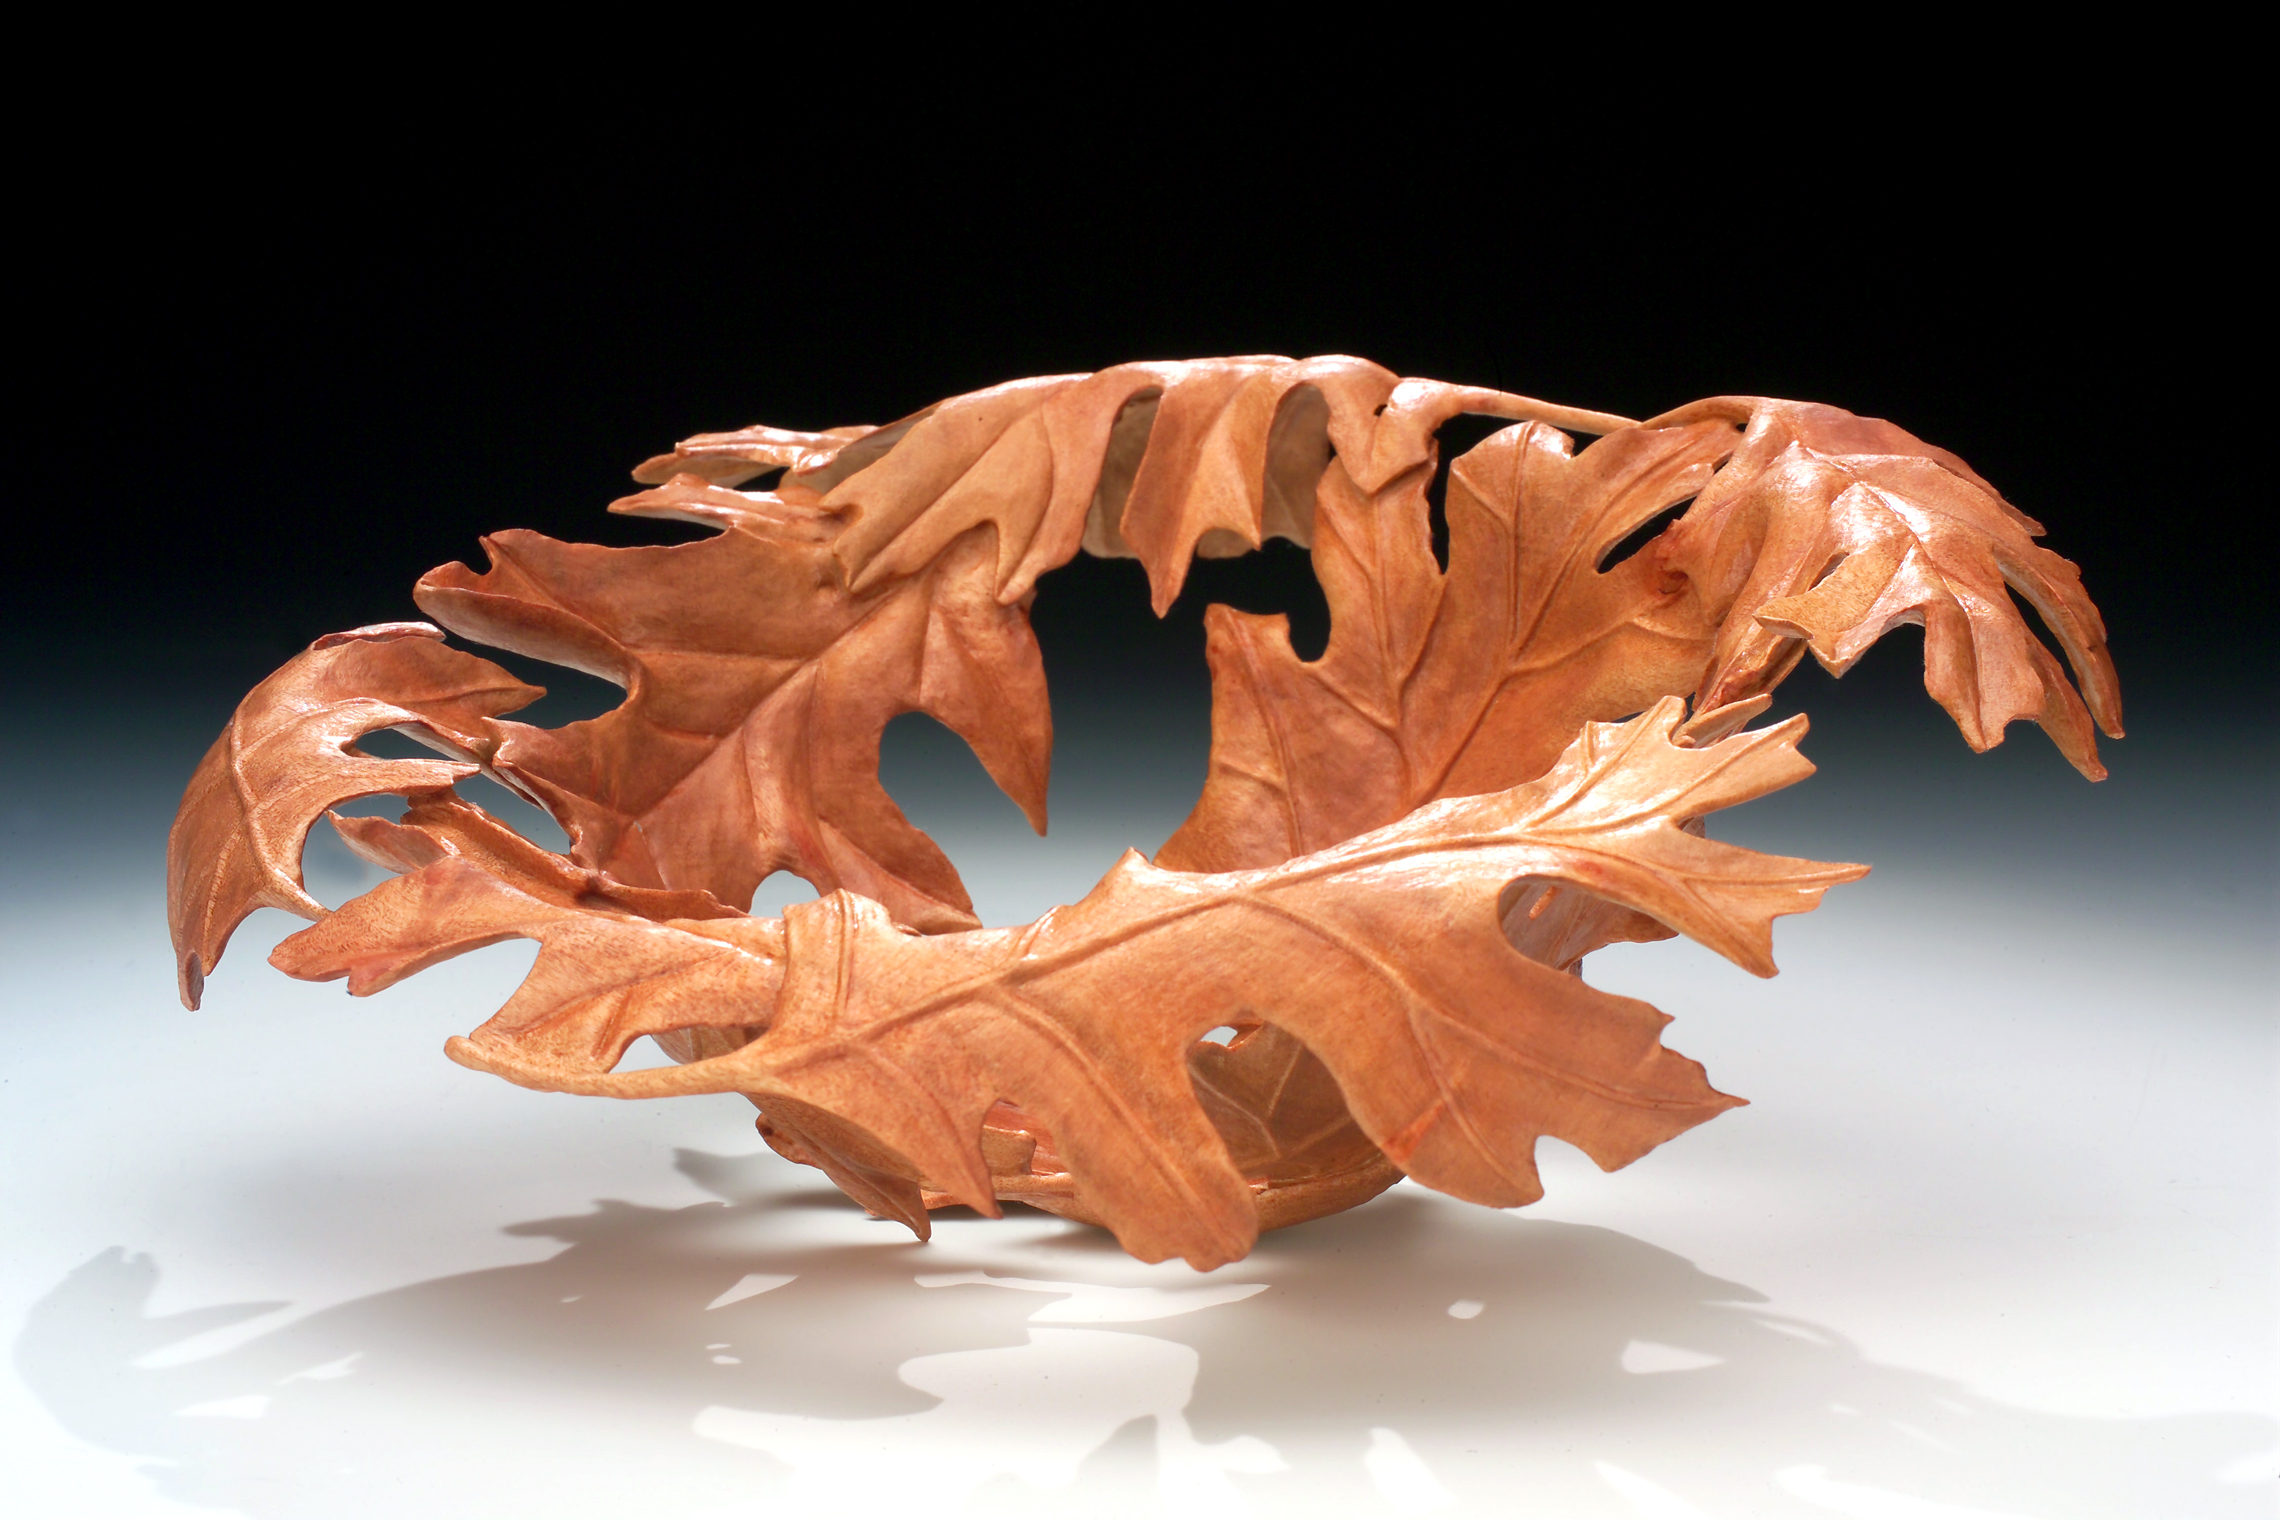 Quercus rubra: African sumac